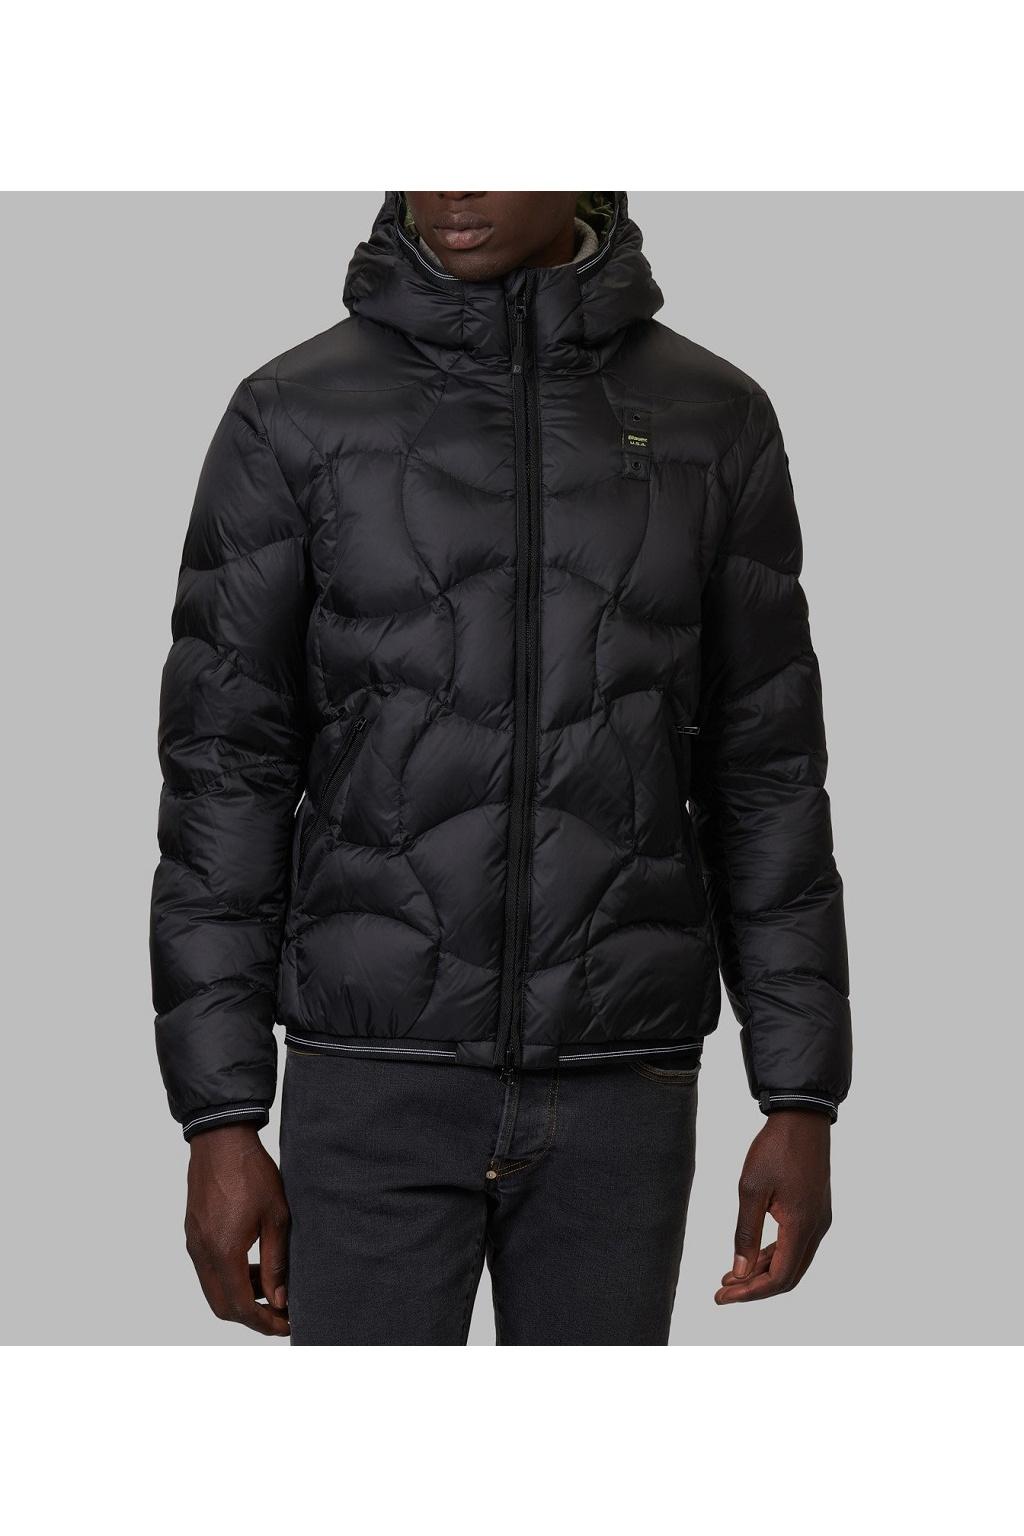 Pánská zimní bunda Blauer 21WBLUC03070 černá